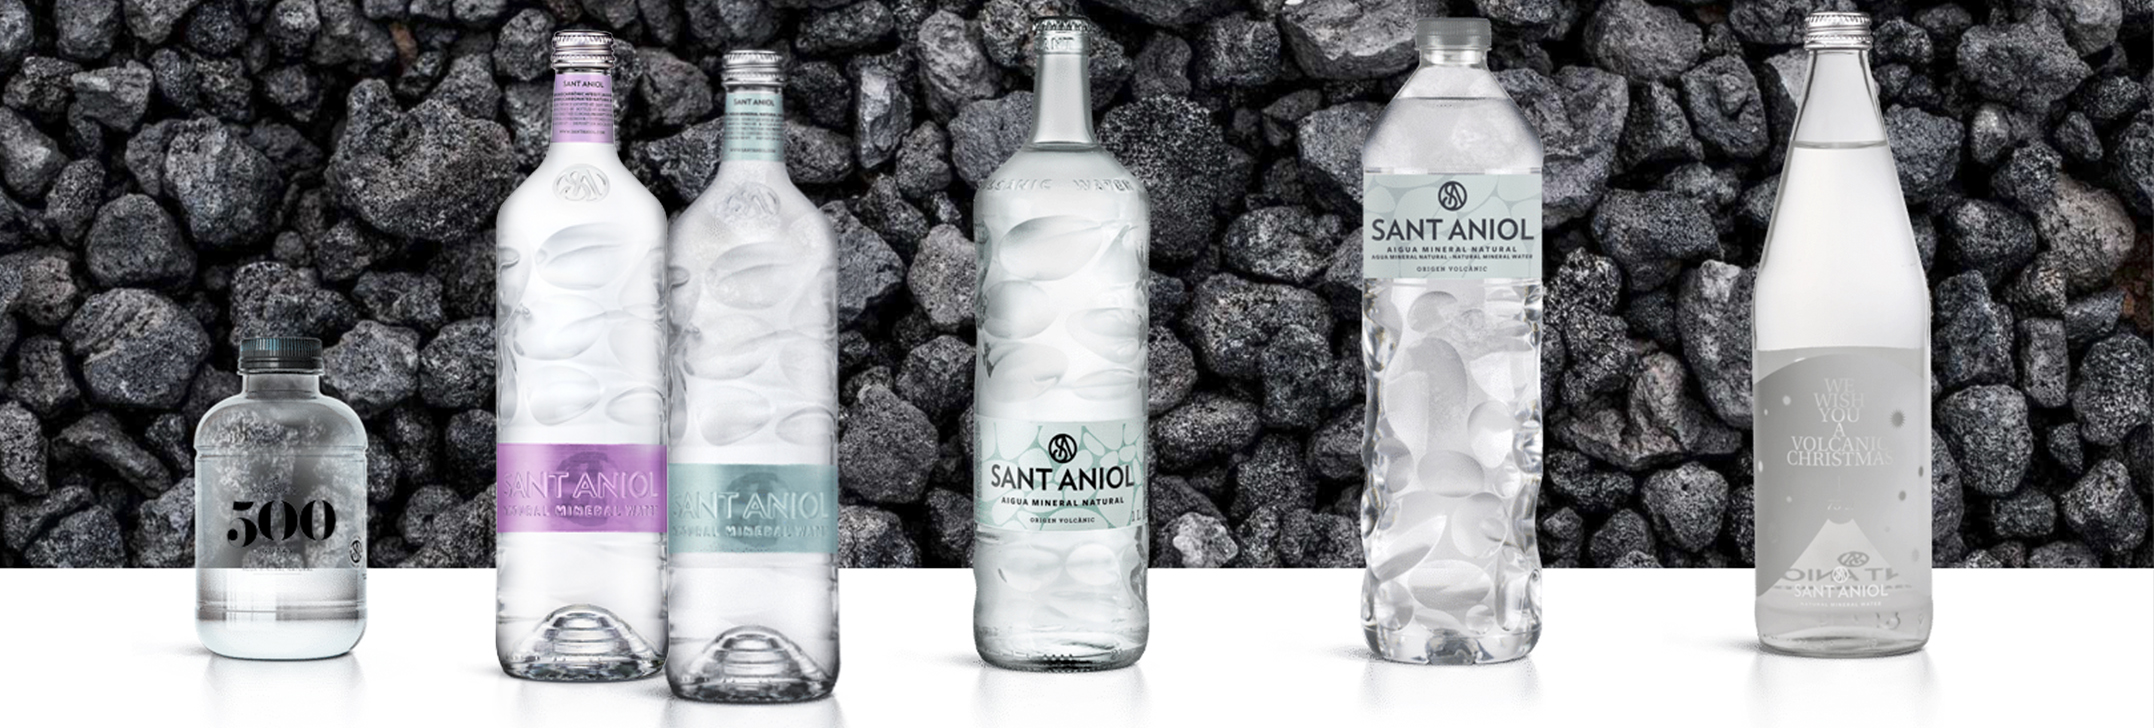 Sant Aniol, Agua Volcánica de la Garrotxa